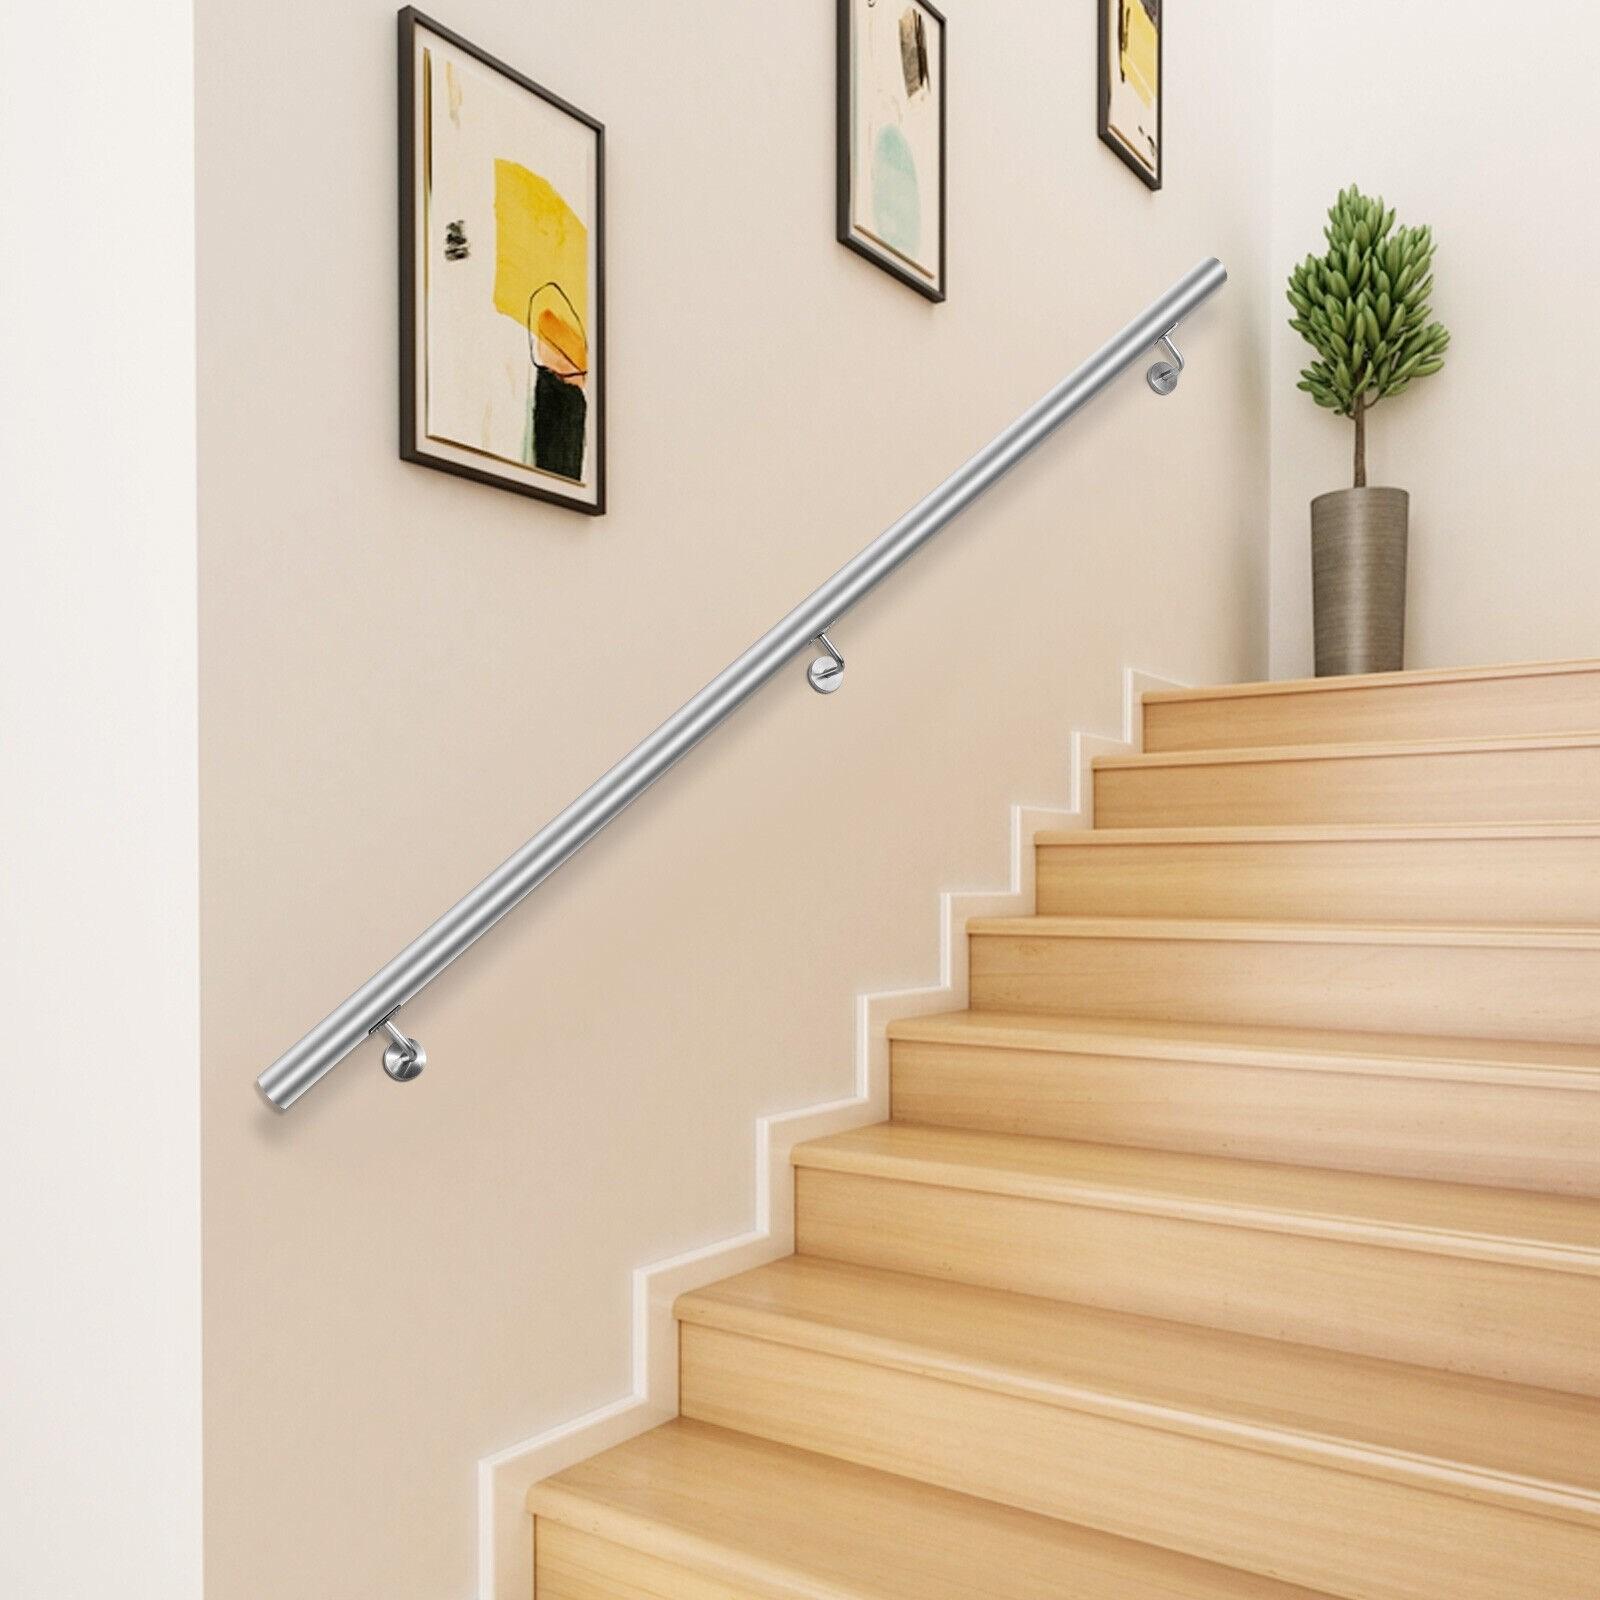 Stair Handrail Stair Rail 3Ft Stainless Steel Handrails For Stairs | Steel Handrails For Steps | Baluster | Aluminum | Steel Tube | Price | Designing